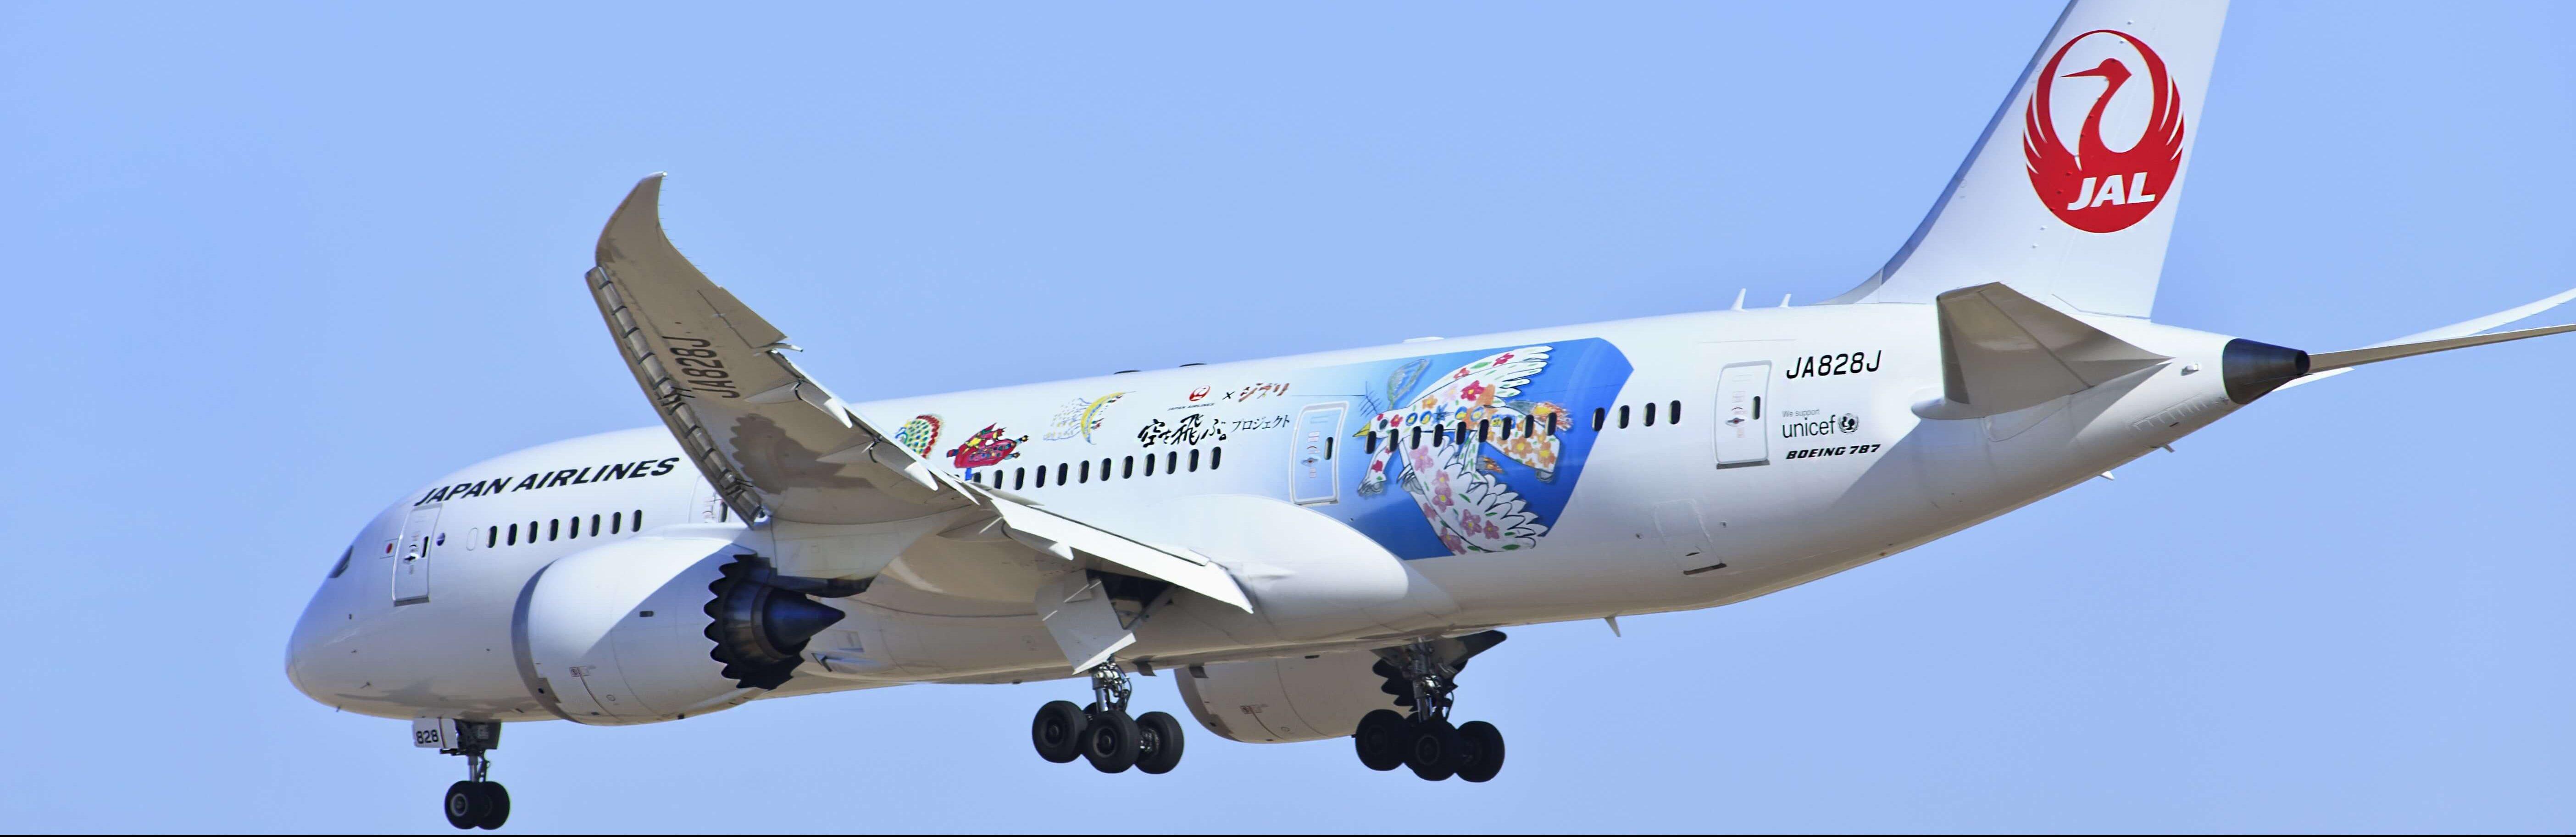 APU maintenance services for Japan Airlines A350 fleet